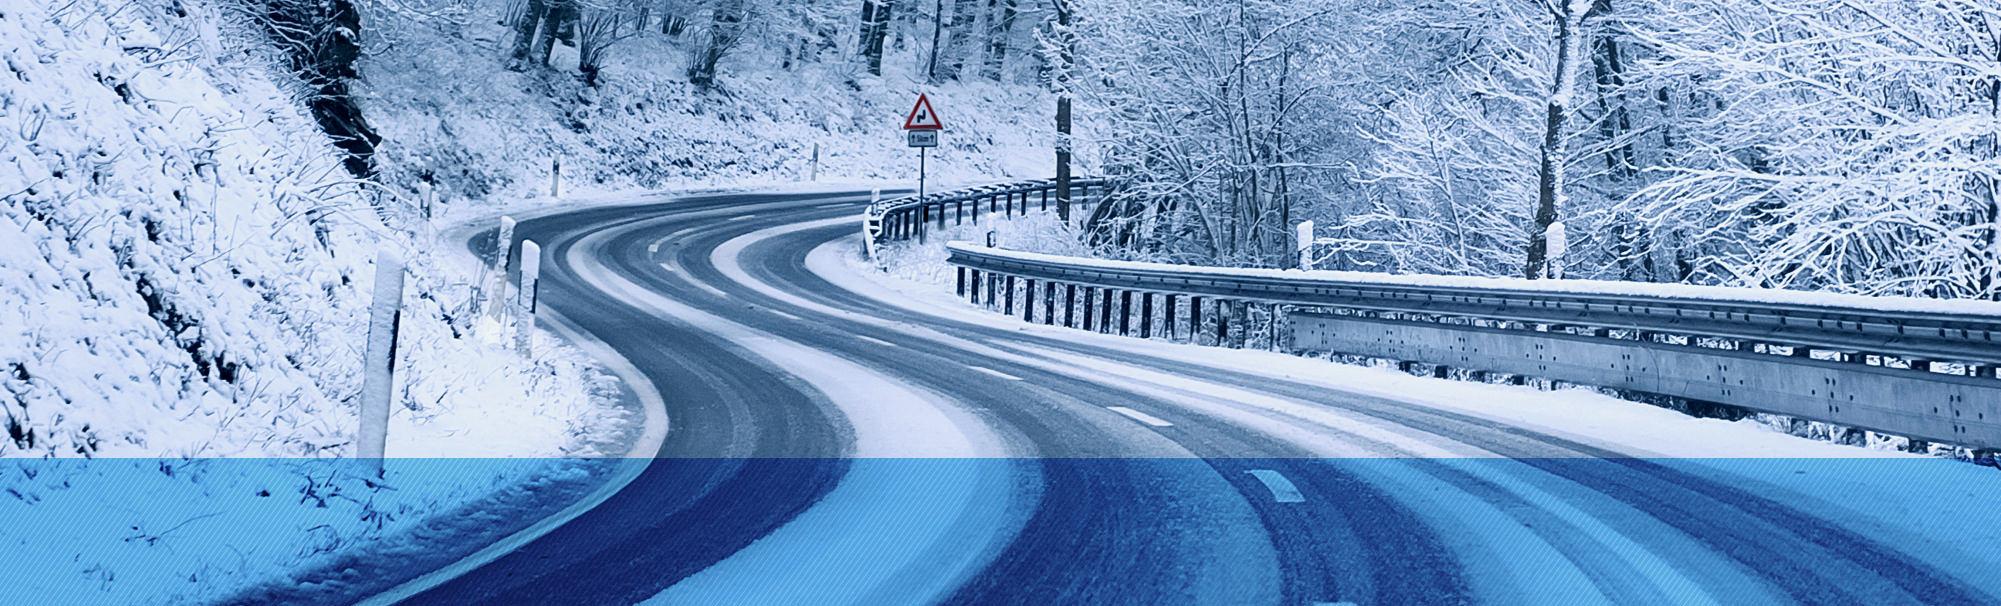 JMR-sliders-winter-road-web